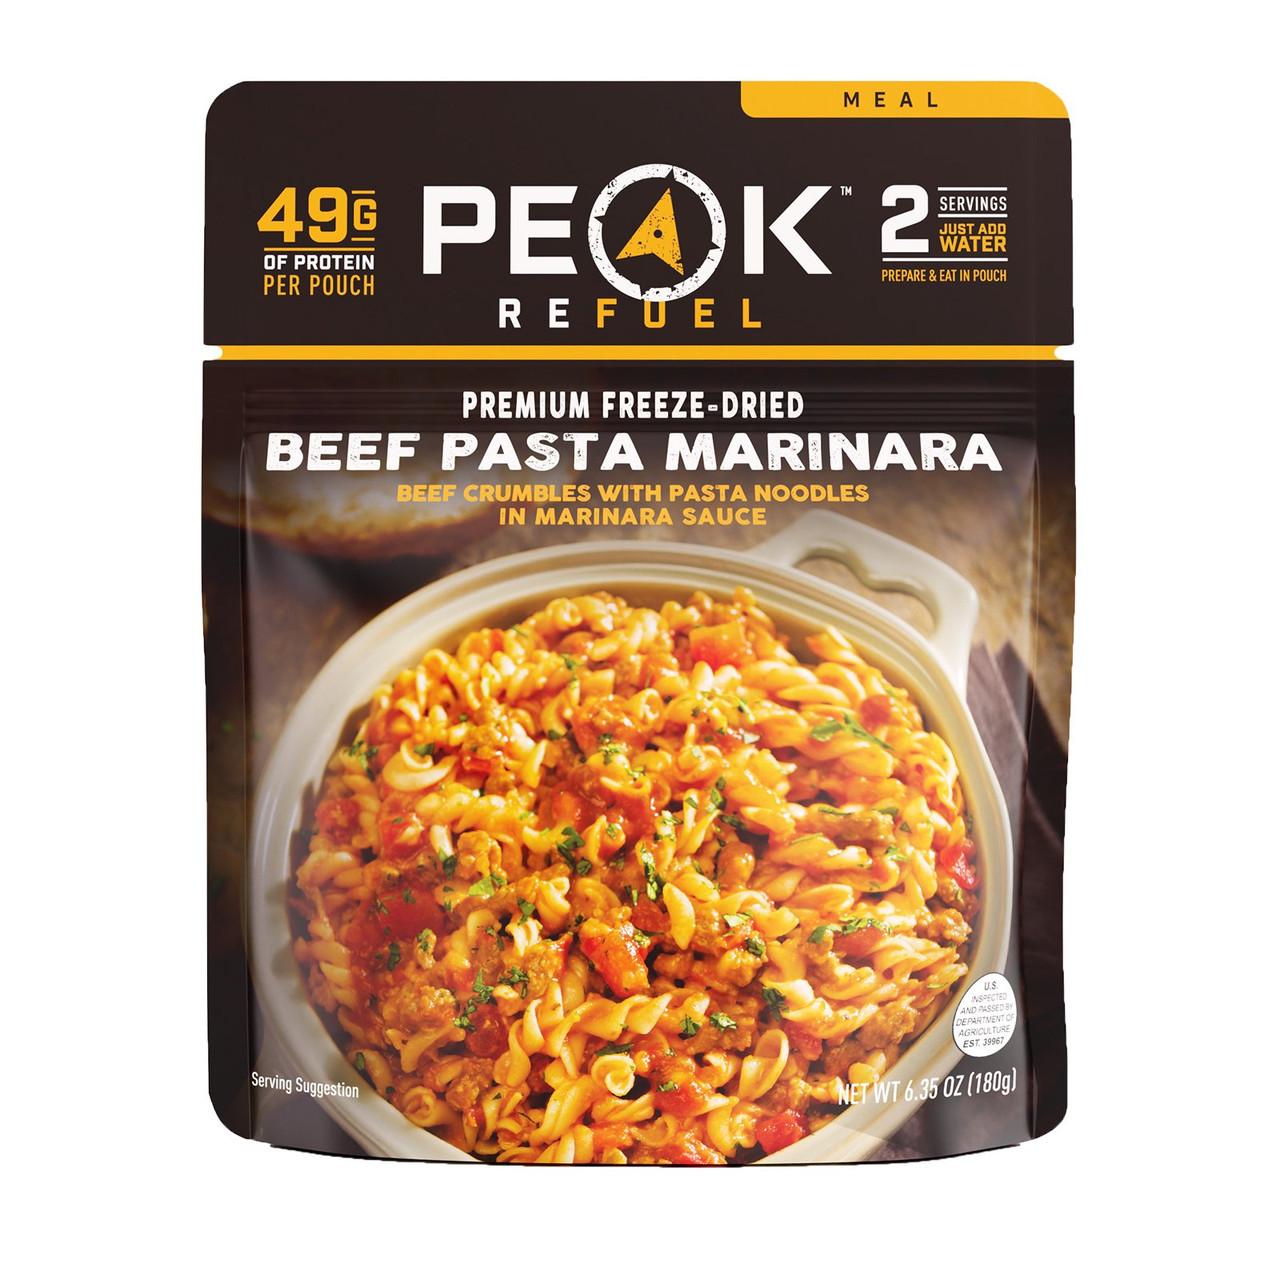 Peak Refuel Beef Pasta Marinara